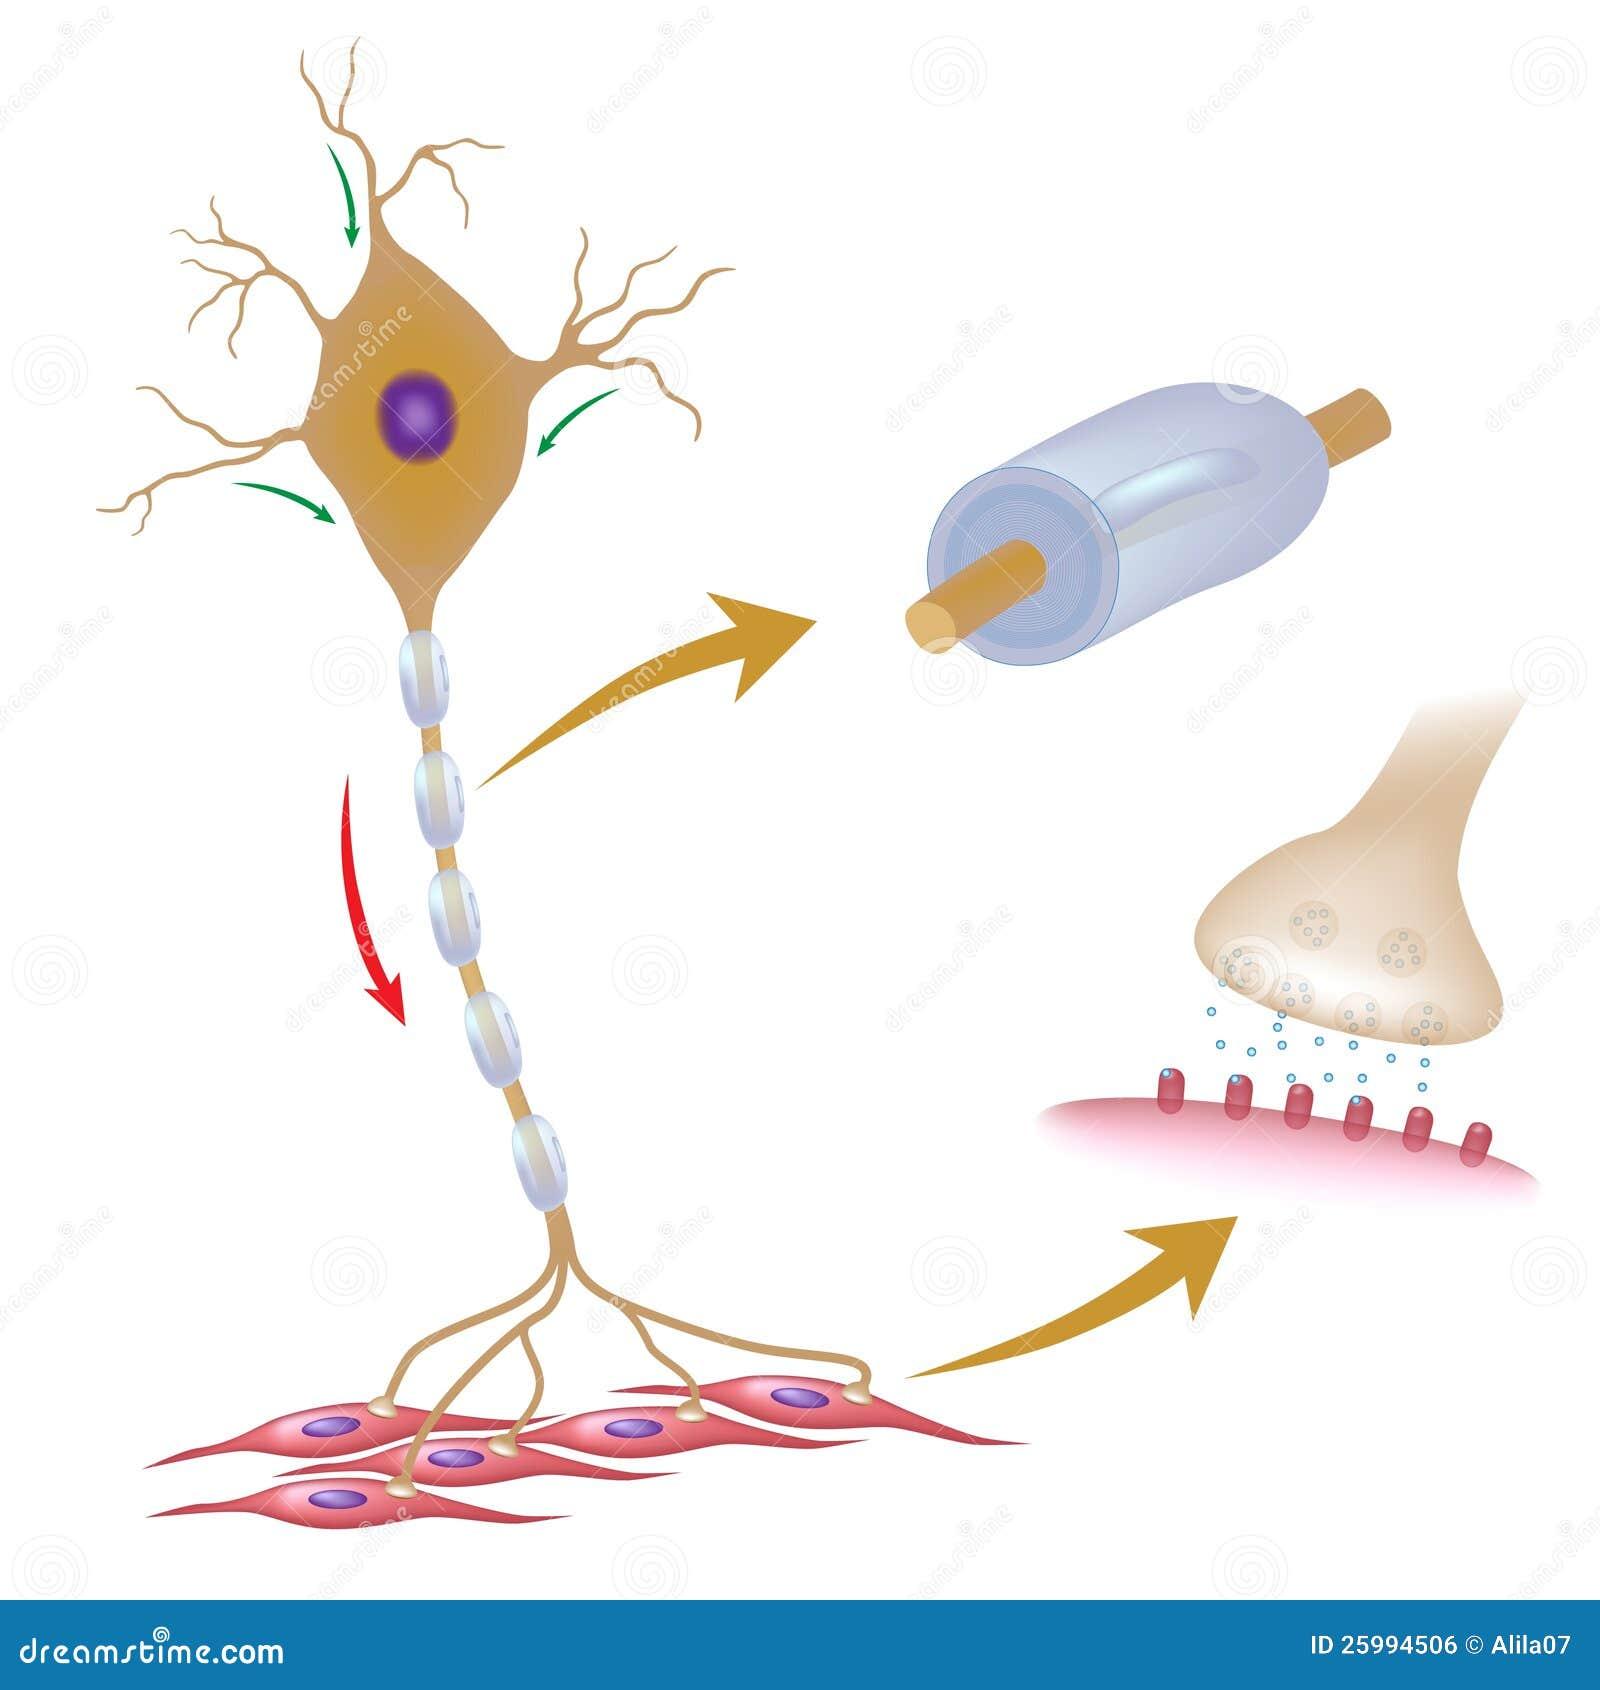 Nervous System Lab Diagram   Free Download Wiring Diagram Schematic